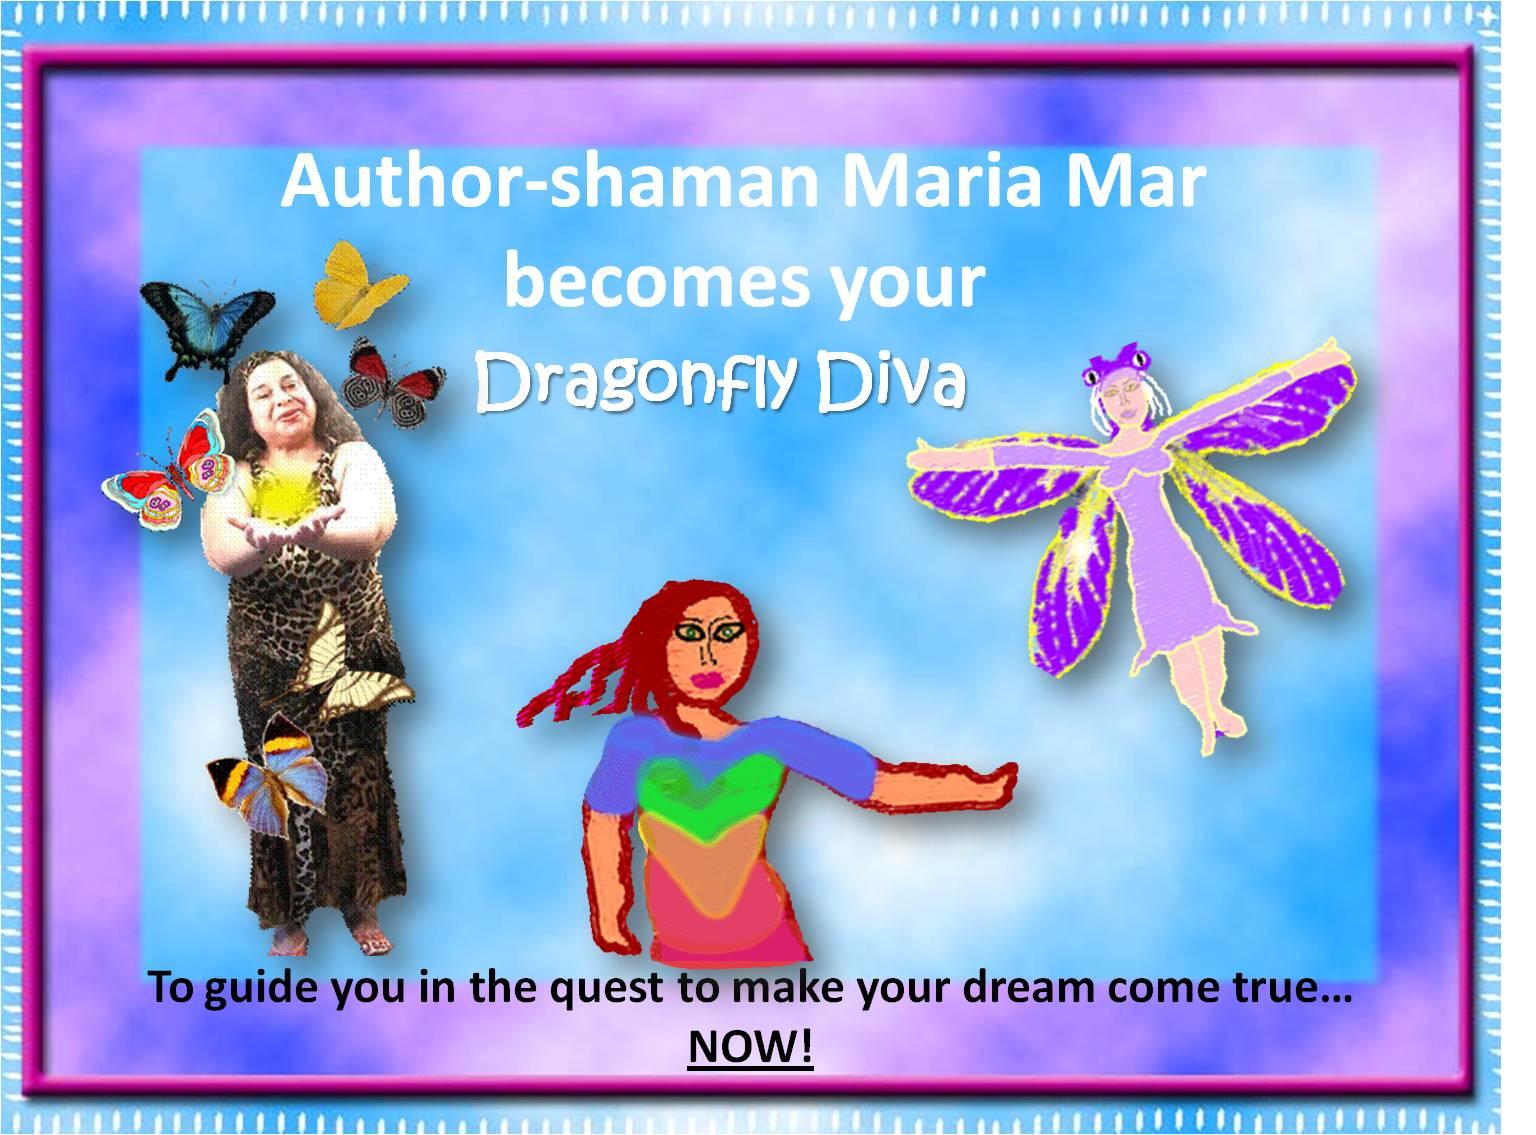 dreamexpress-virtualtourB-slide18-mariamar